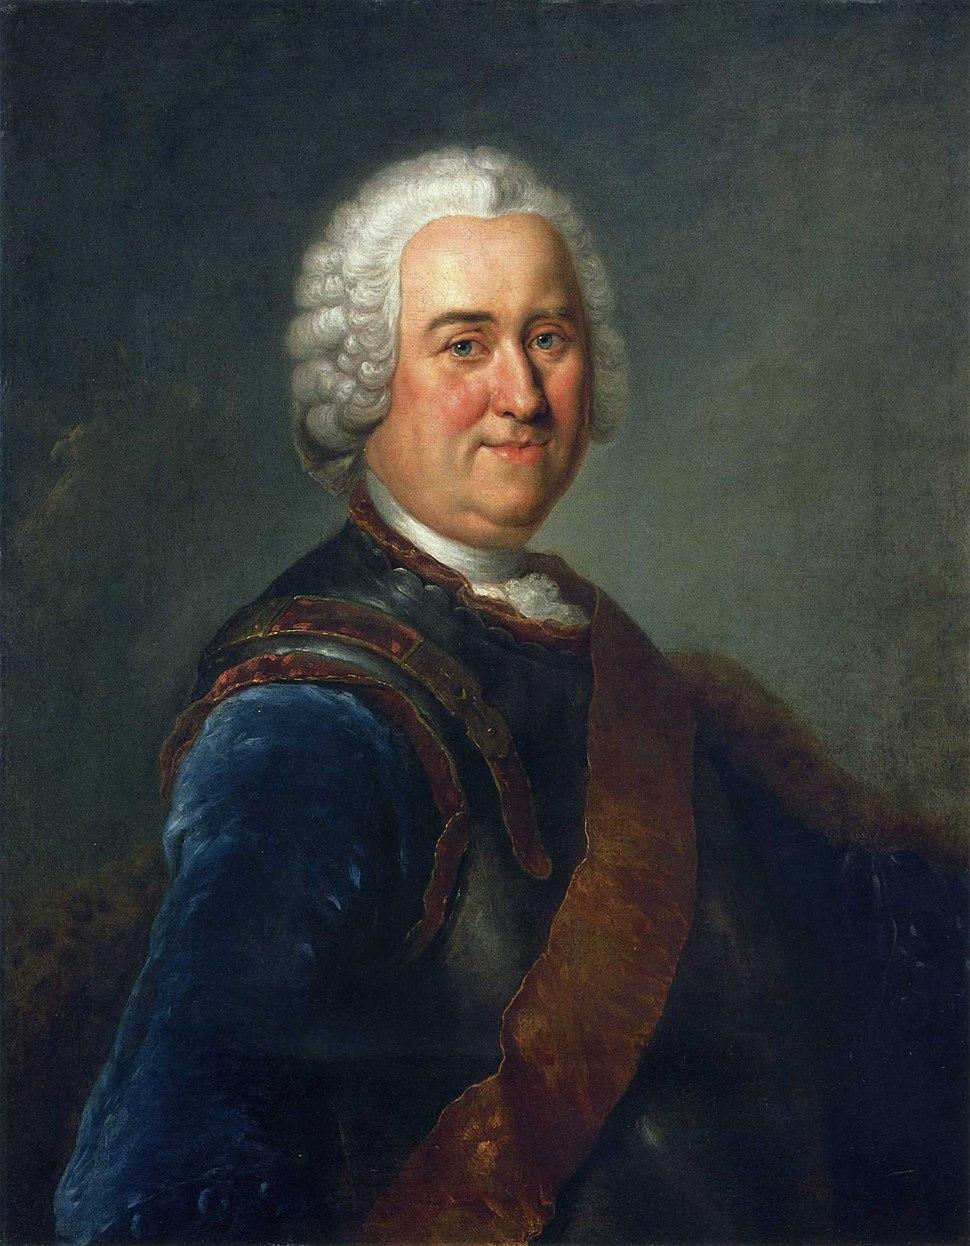 Generalfeldmarschall Keith (Pesne)